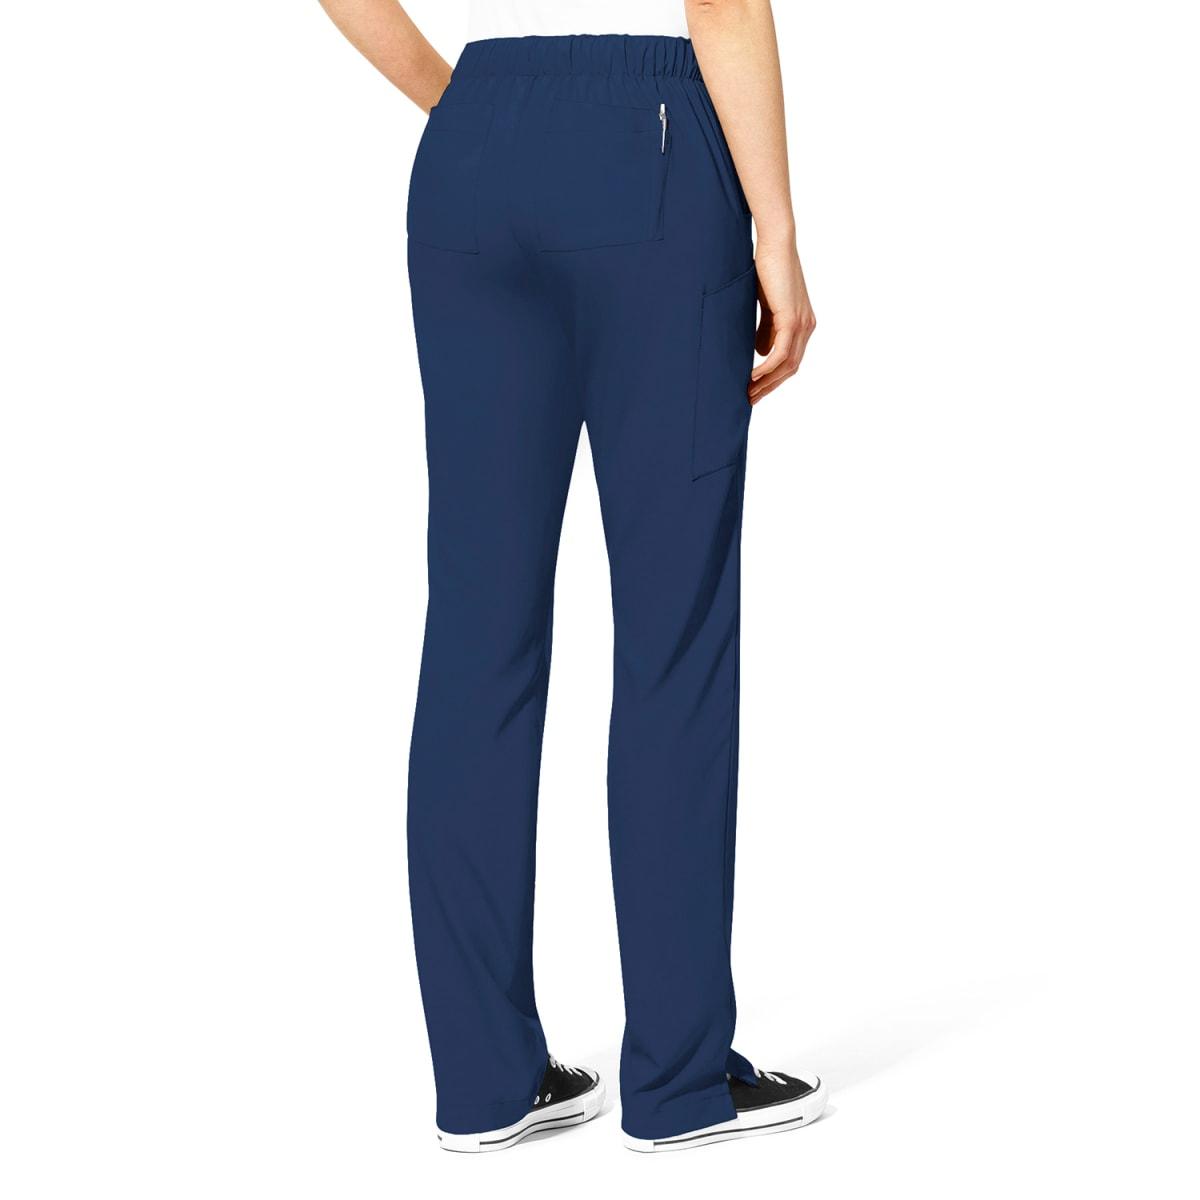 Pantalon Clinico Enfermera Azul Marino W123 5155a Shopsale Uniformes